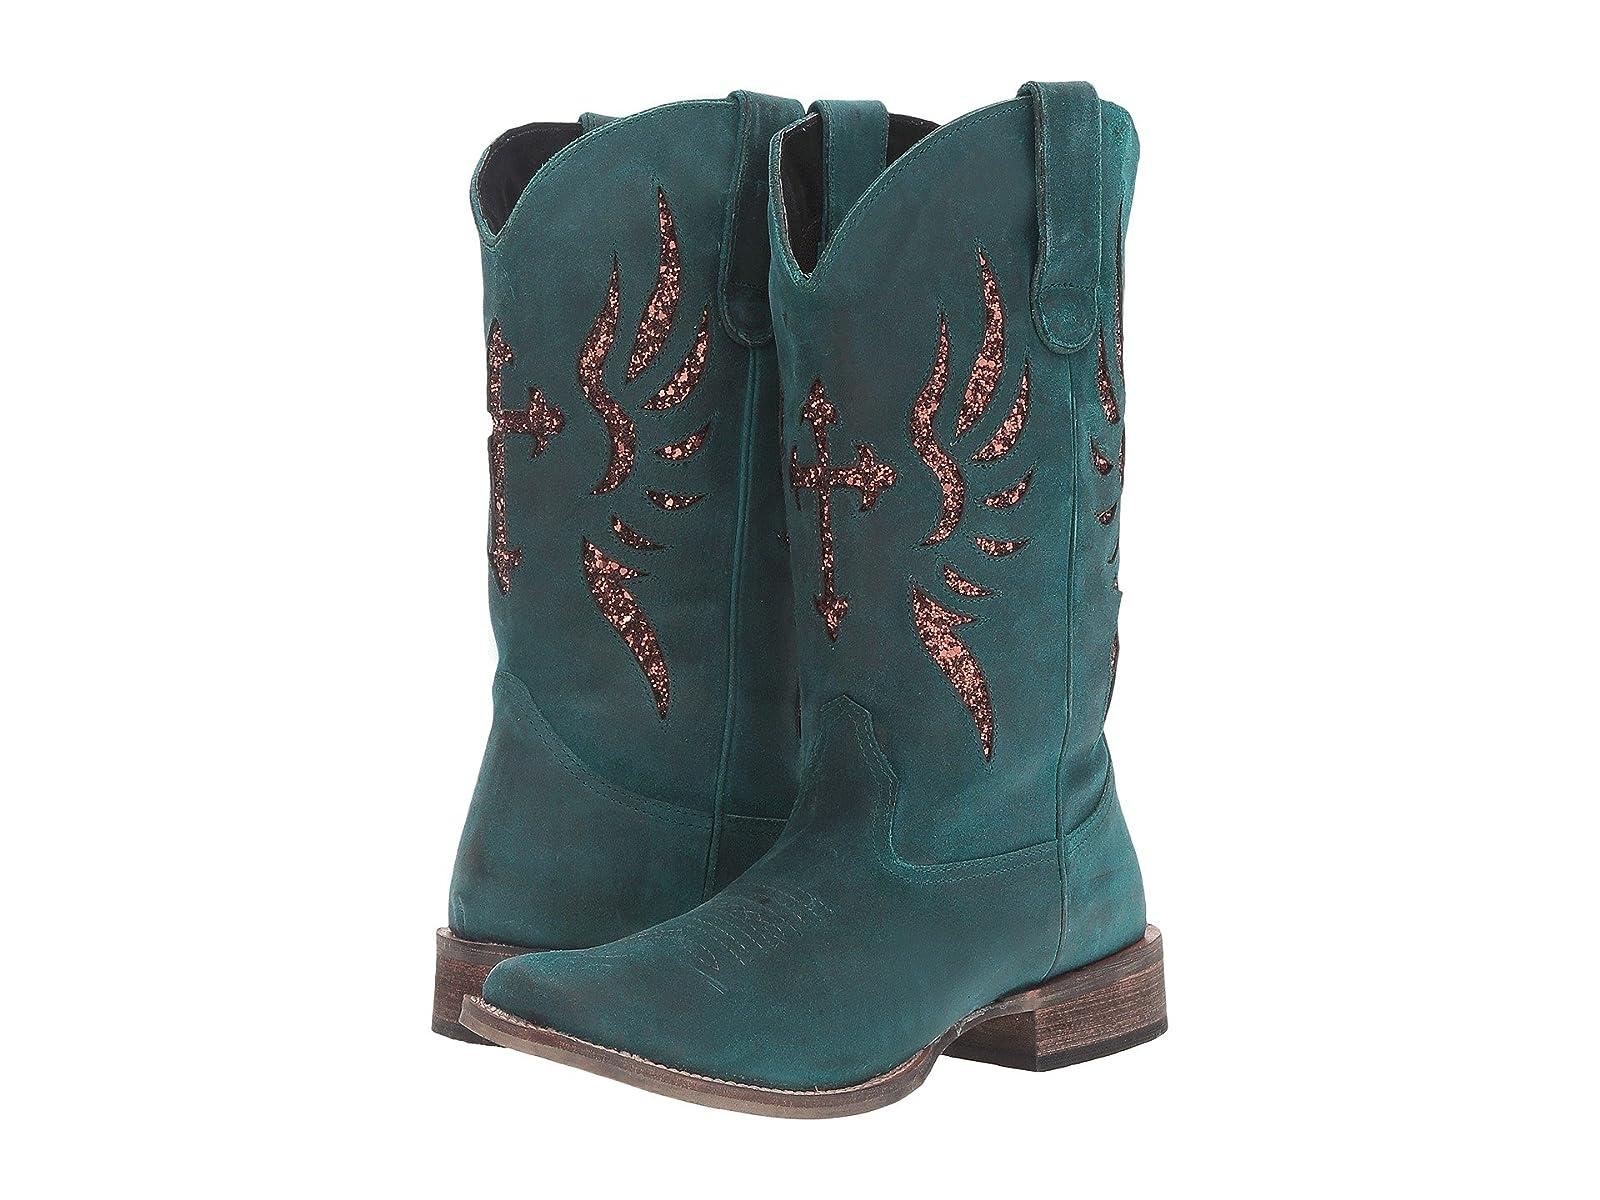 Roper Glitter WingsCheap and distinctive eye-catching shoes